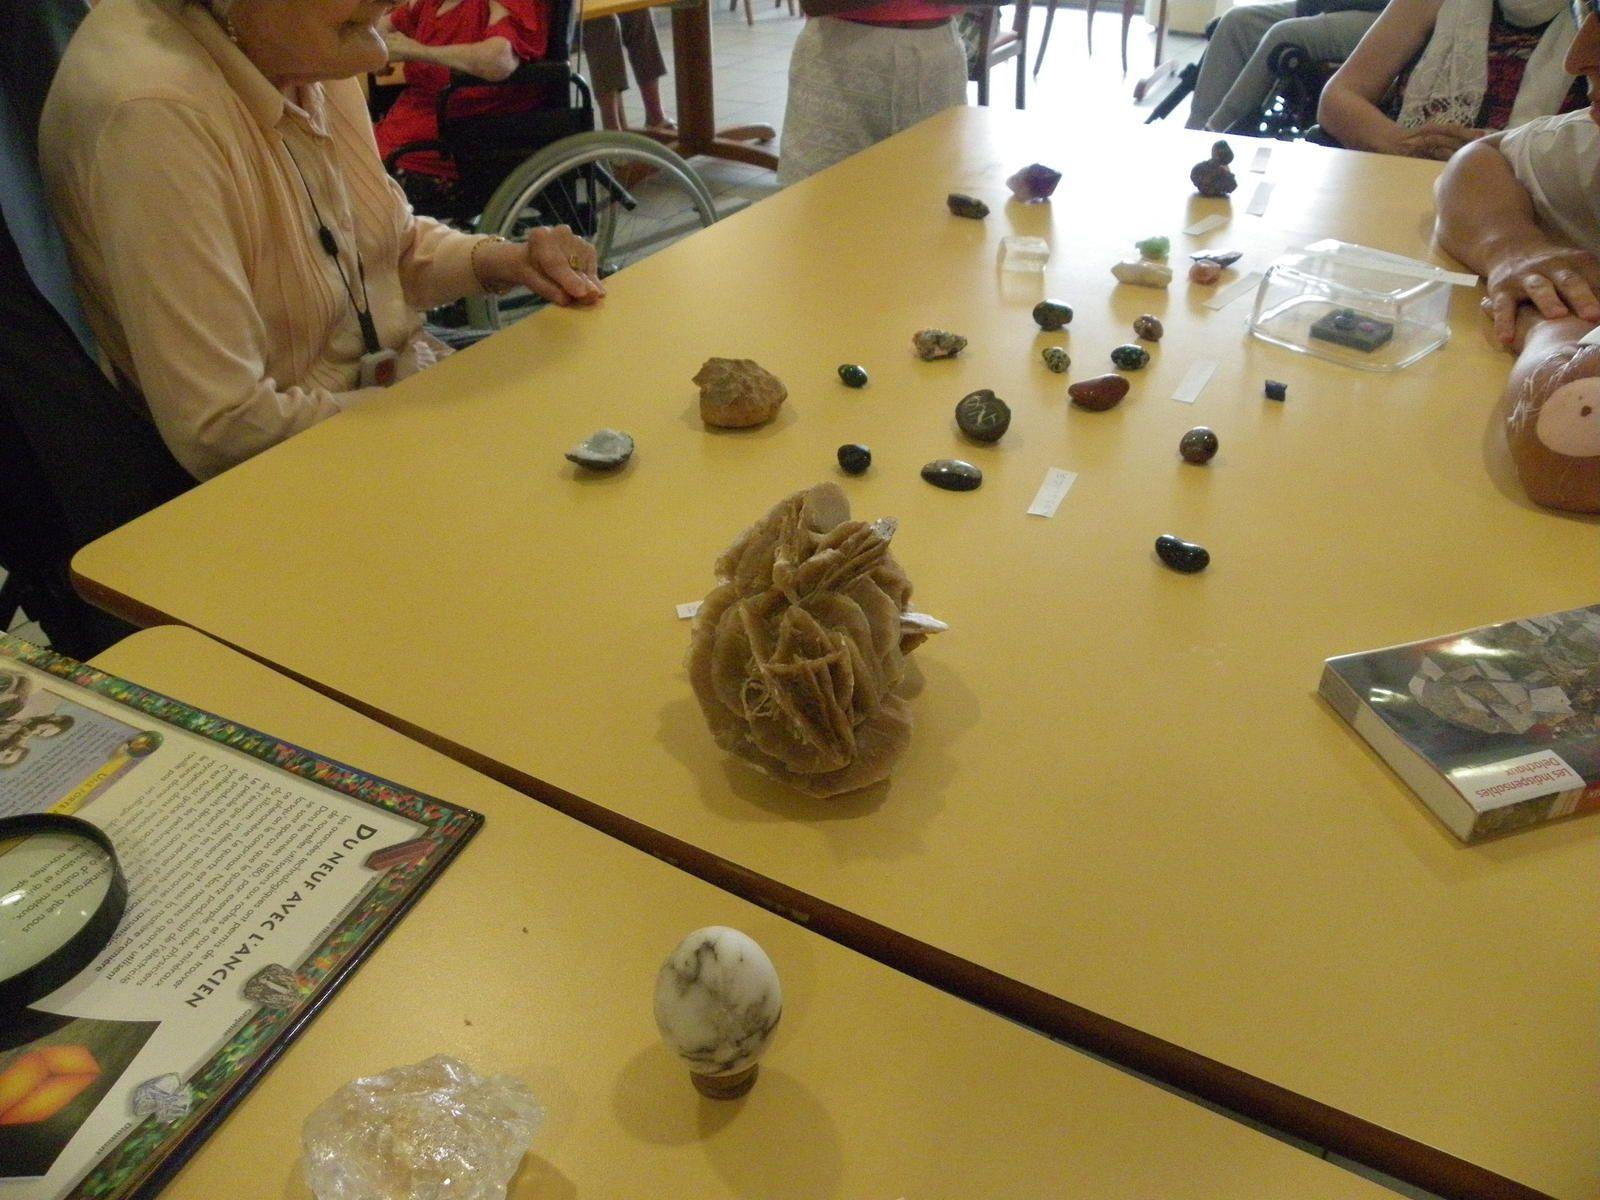 Exposition de pierres